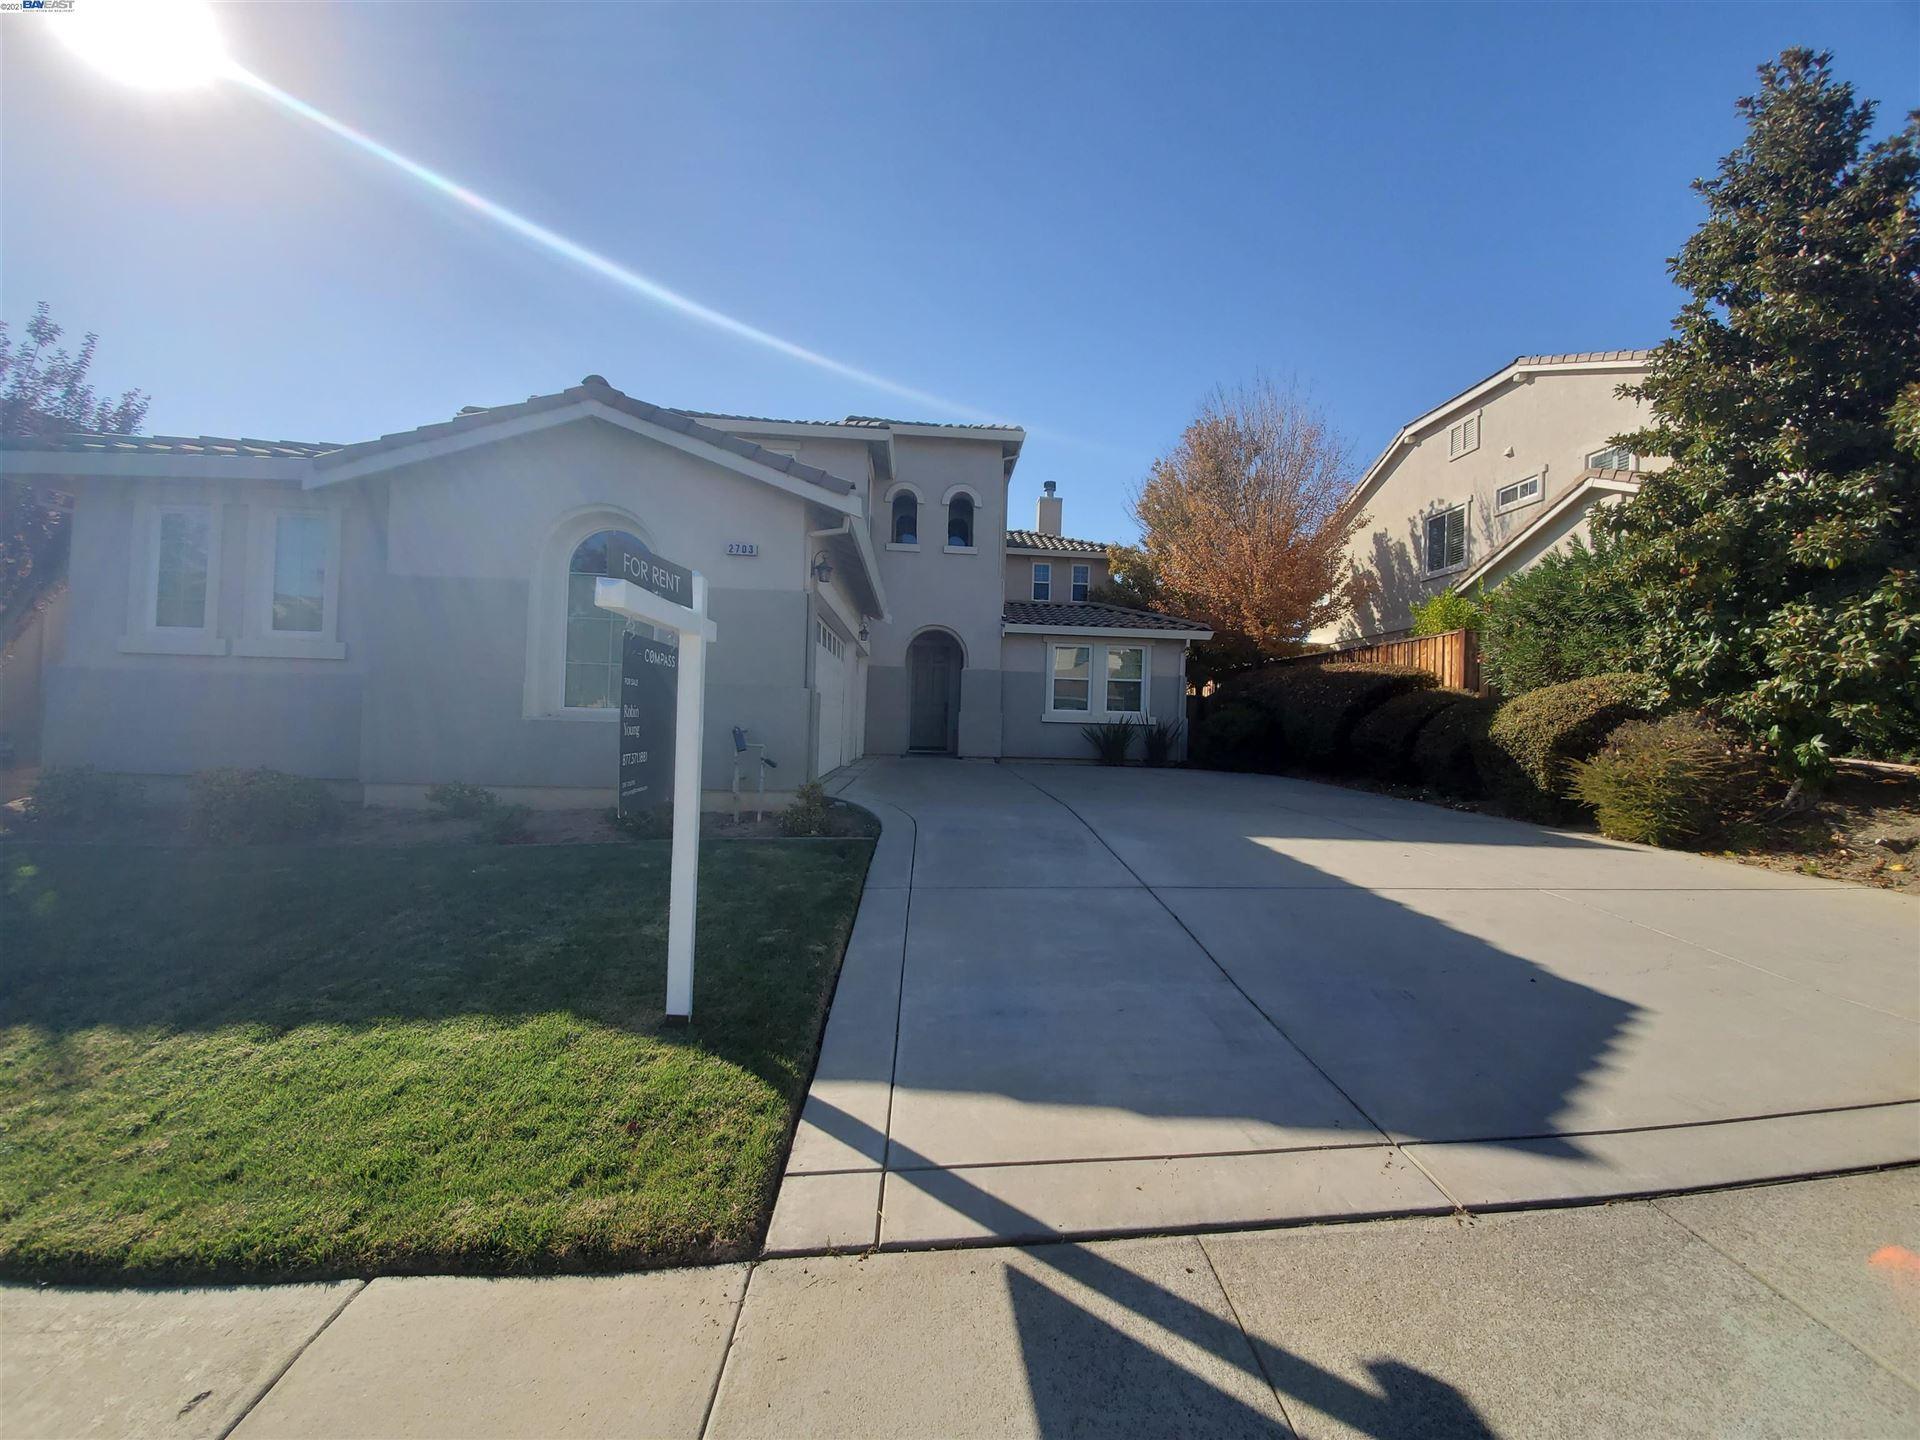 Photo of 2703 Presidio Dr, Brentwood, CA 94513 (MLS # 40970607)